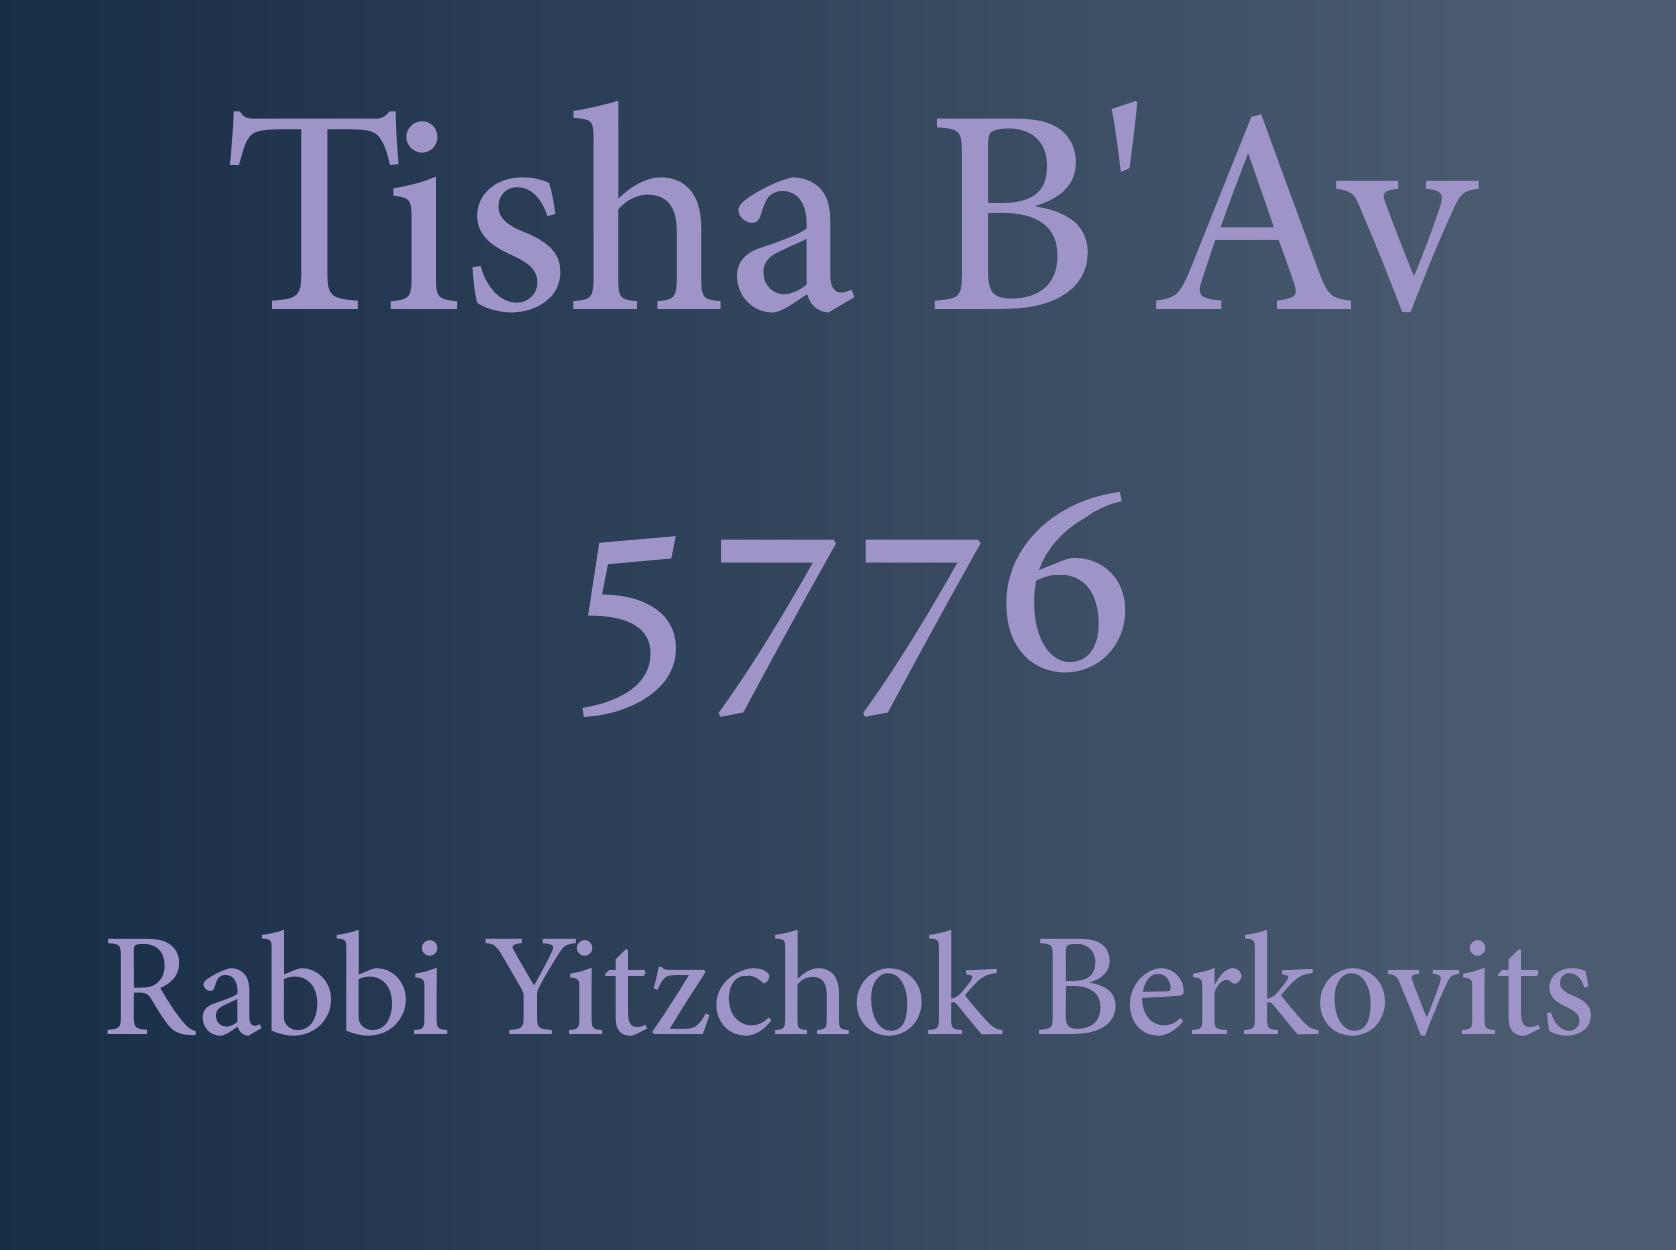 Tisha b'Av 5776